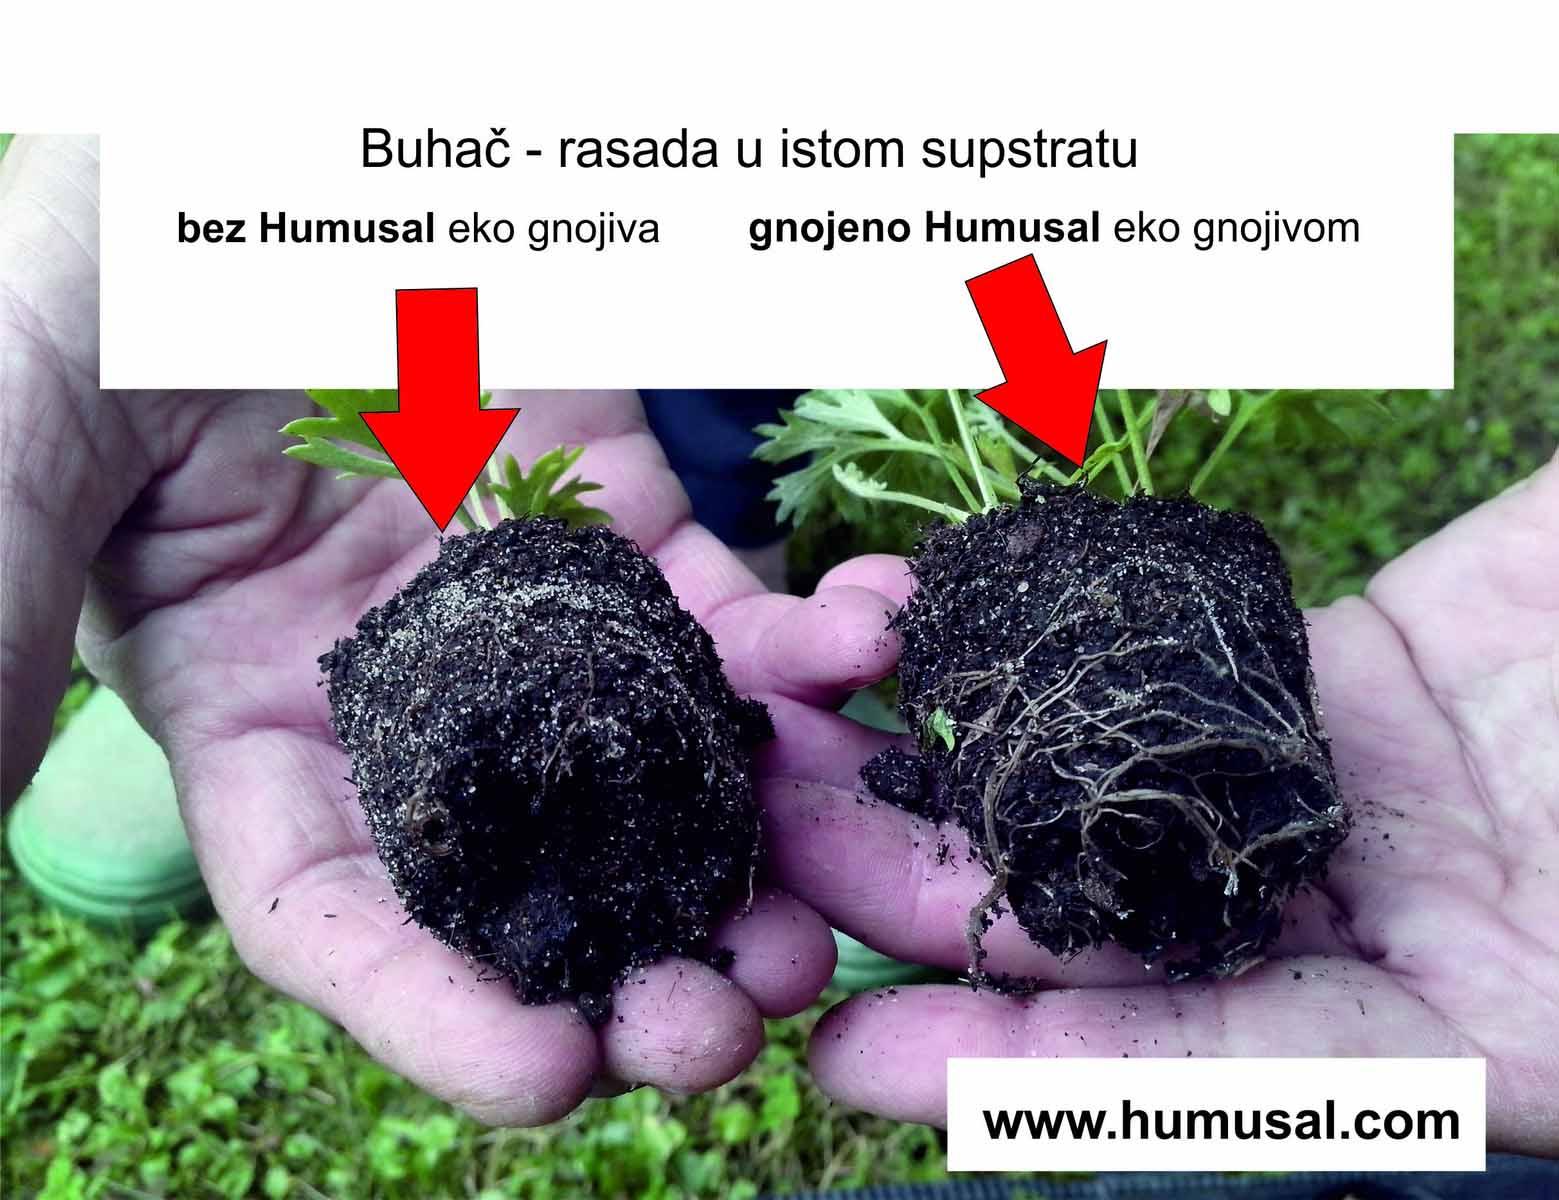 IMG_20140614_152653 - buhac eko gnojivo